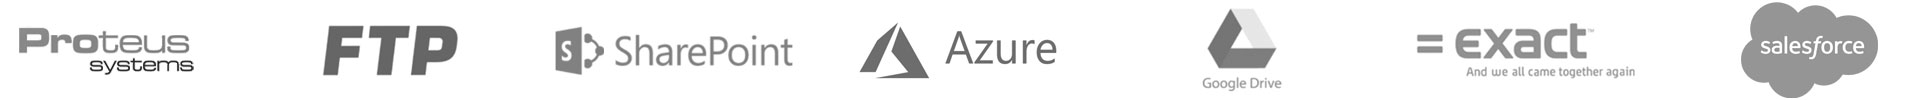 Integraties-overzicht-logos